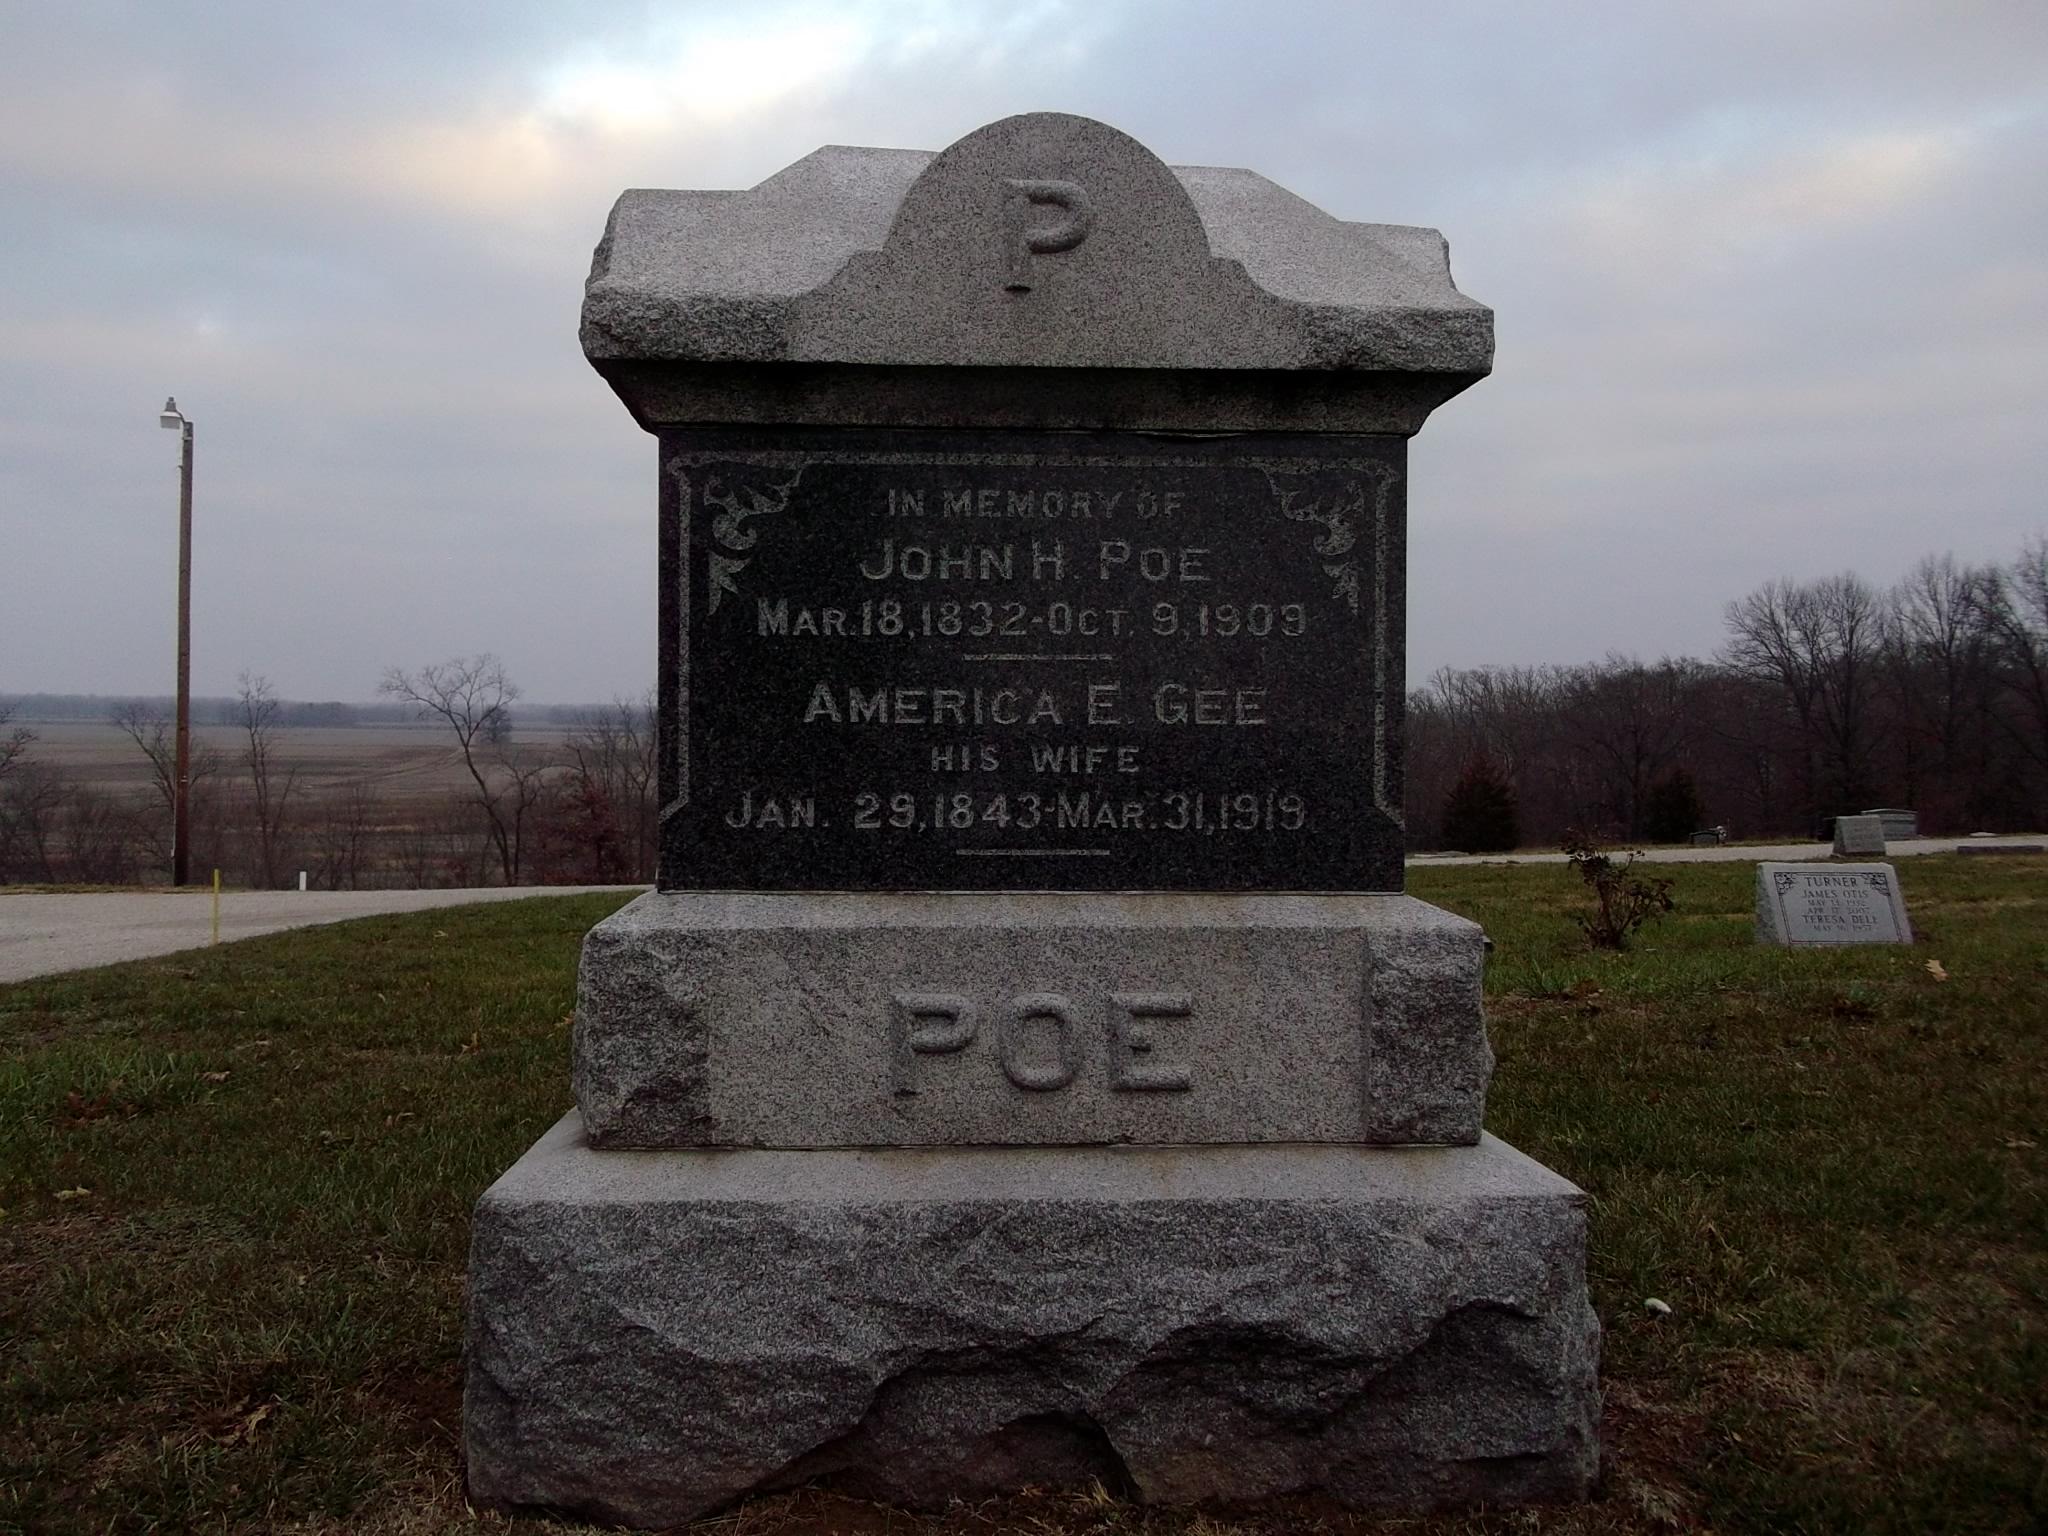 John C Poe